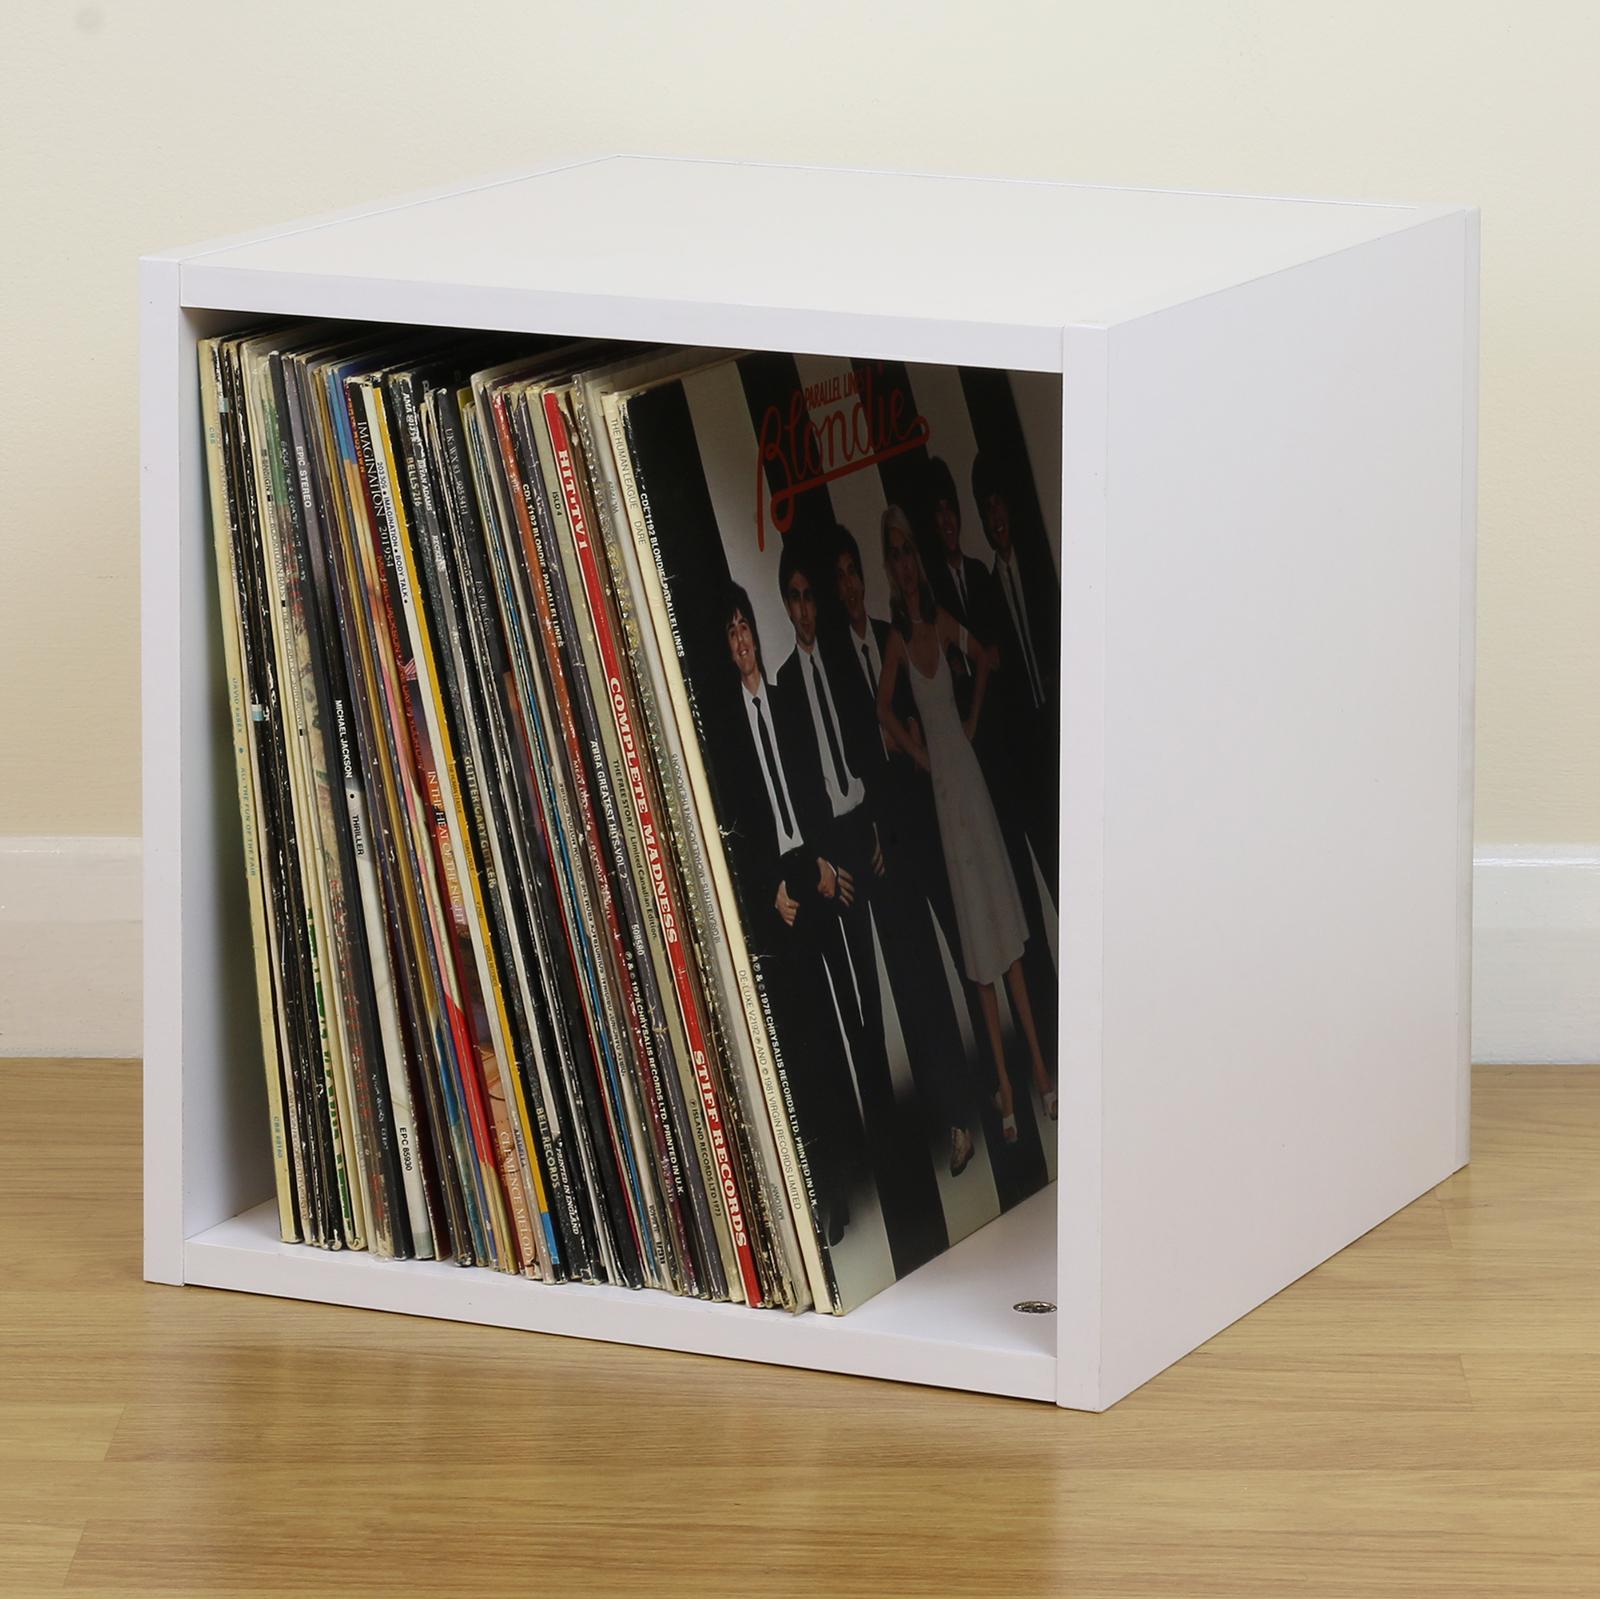 lp storage furniture. Sentinel White Square LP/Vinyl Music Record Storage Cube/Cabinet Box Home Display Unit Lp Furniture